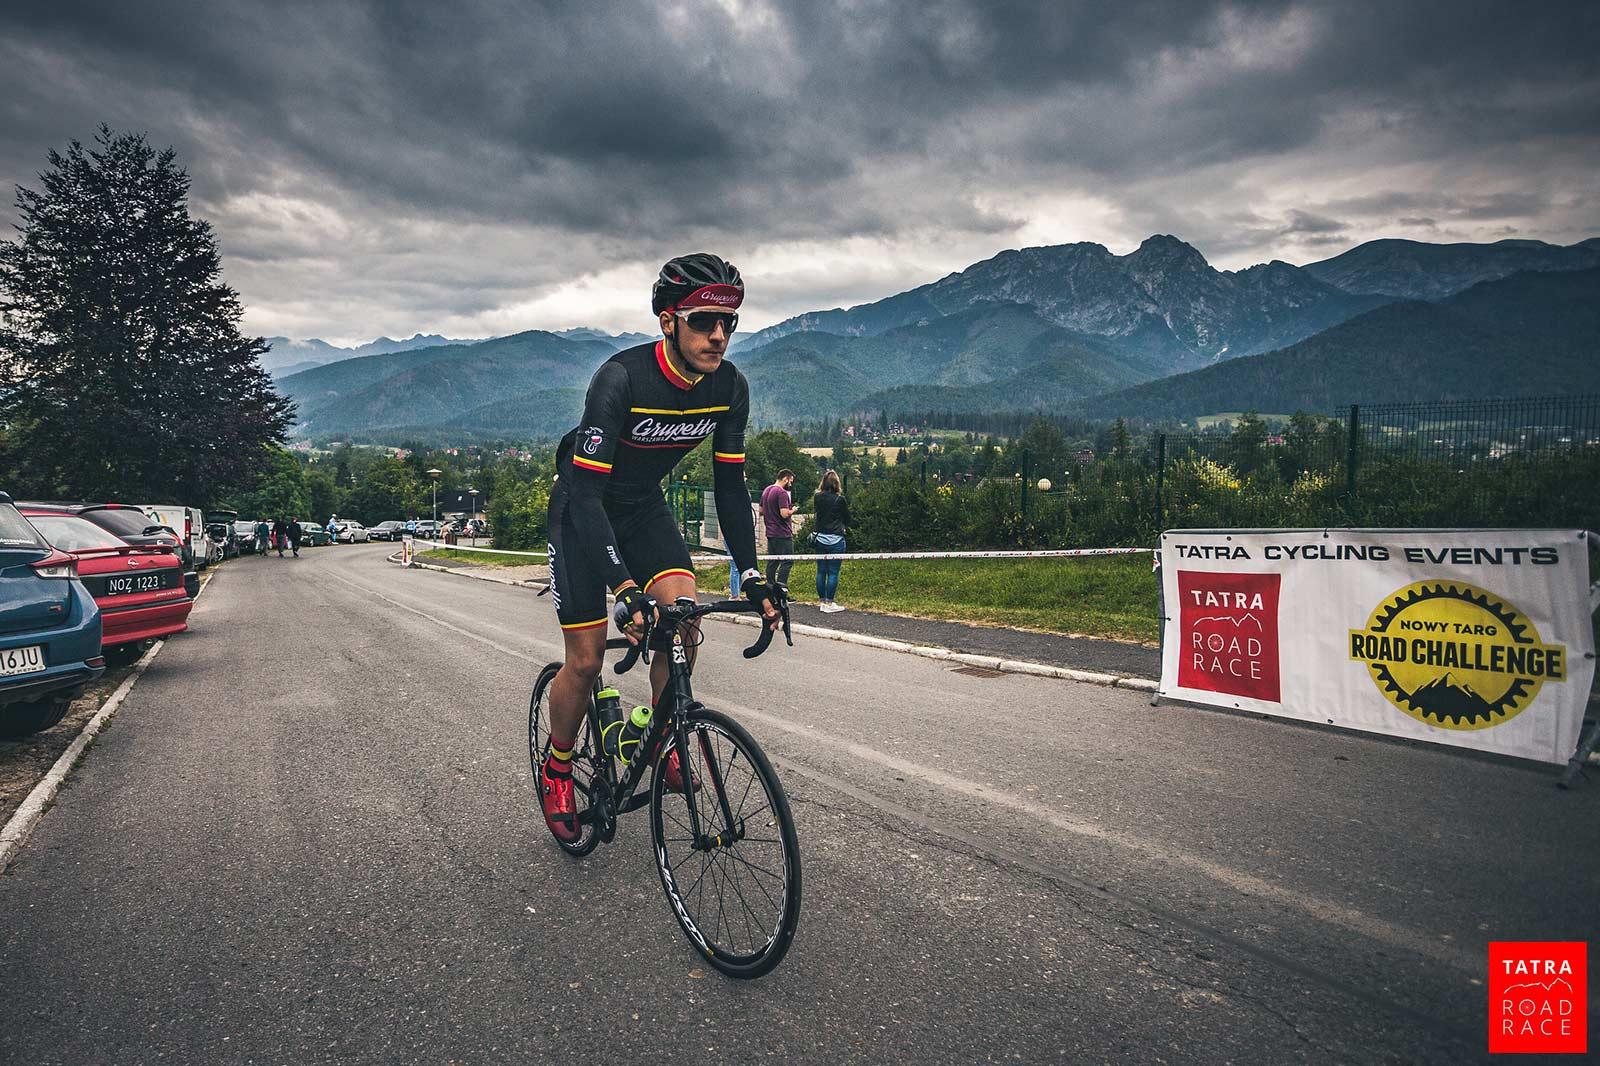 Tatra-Road-Race-7